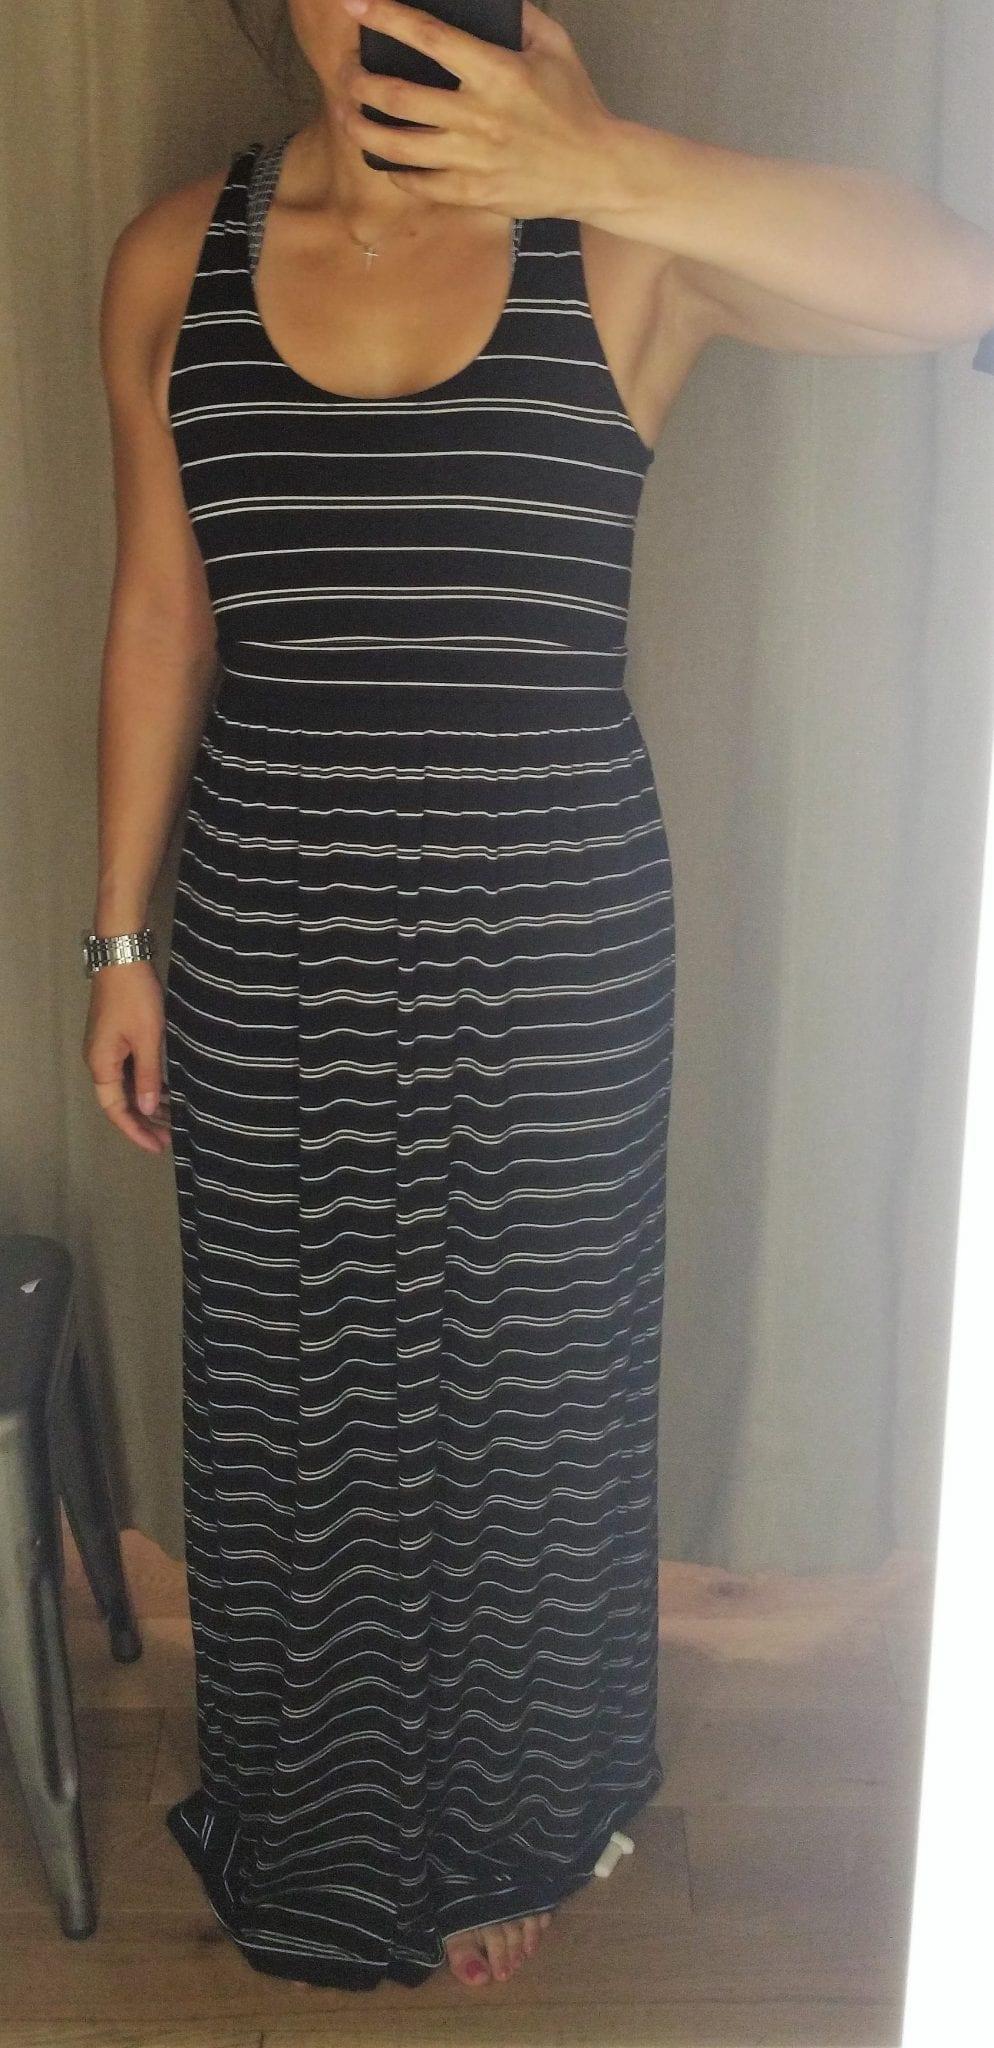 14099481d0 Guest Fit Review: Athleta Downtown Dress, Athleta Striped Maxi Dress